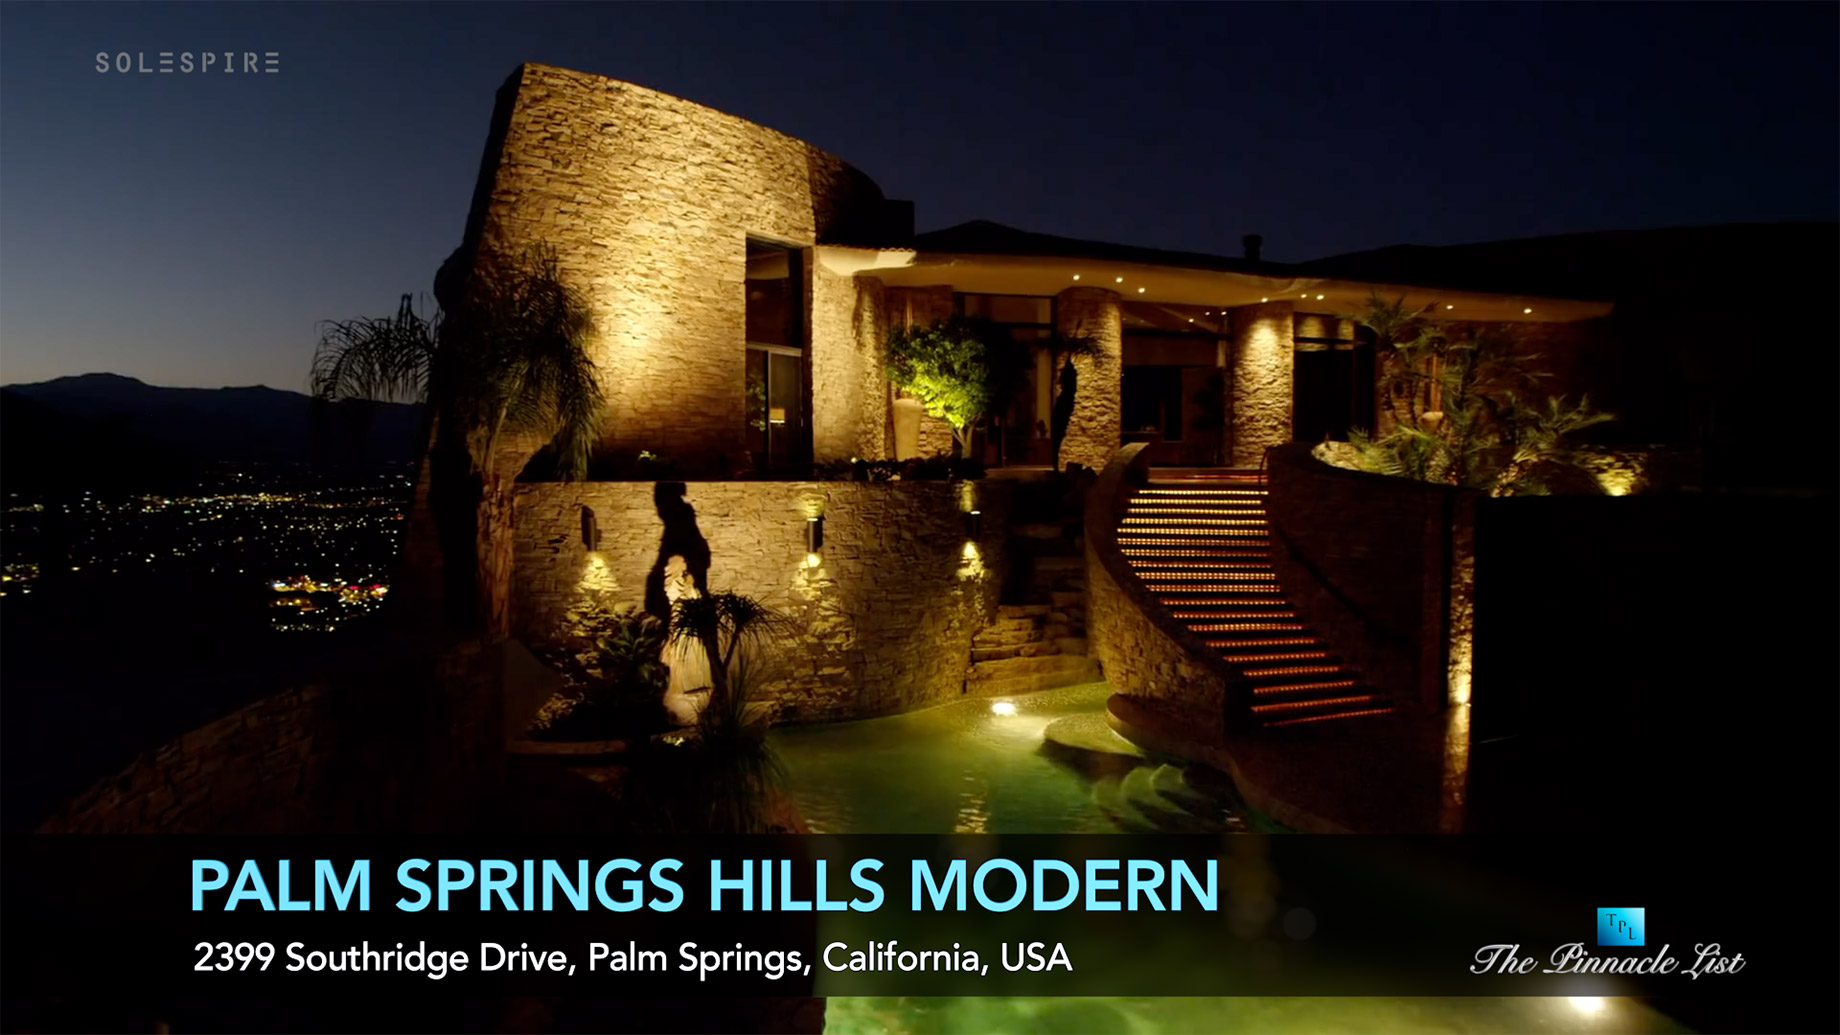 Luxury Modern Estate - 2399 Southridge Dr, Palm Springs, CA, USA - Luxury Real Estate - Video